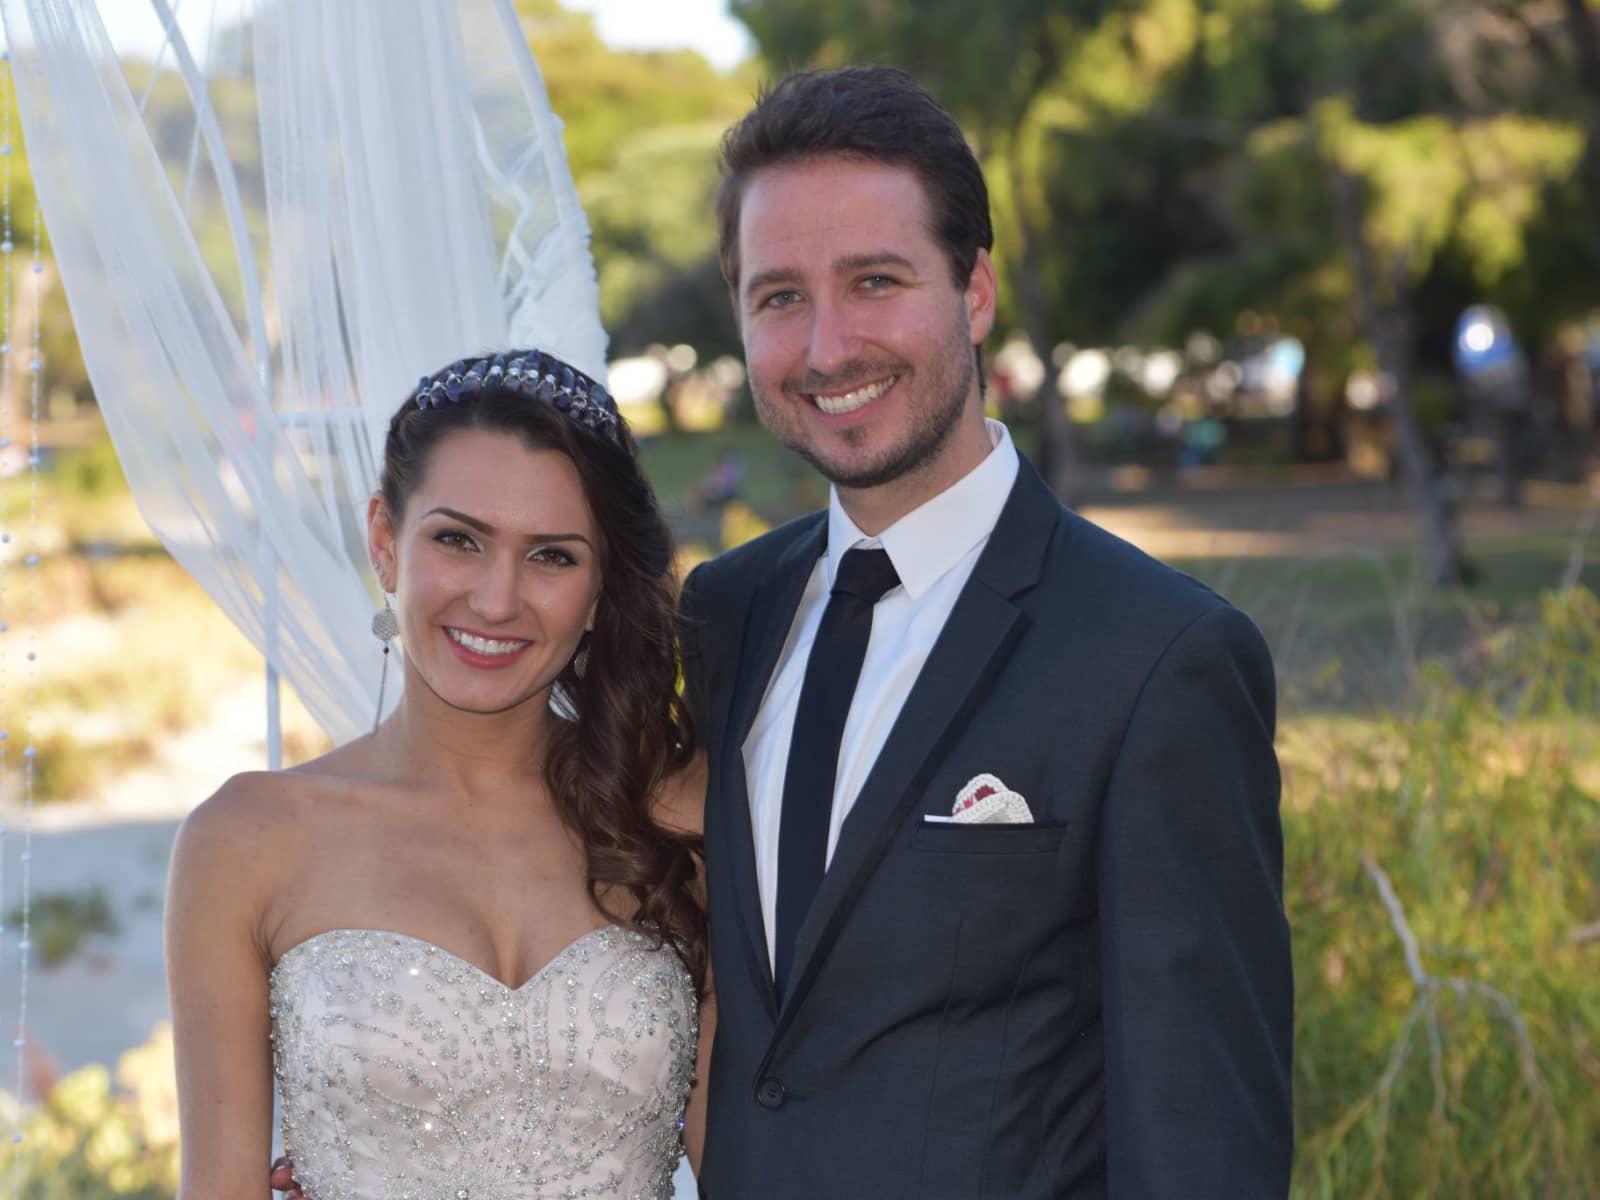 Olivia & Joshua from East Perth, Western Australia, Australia